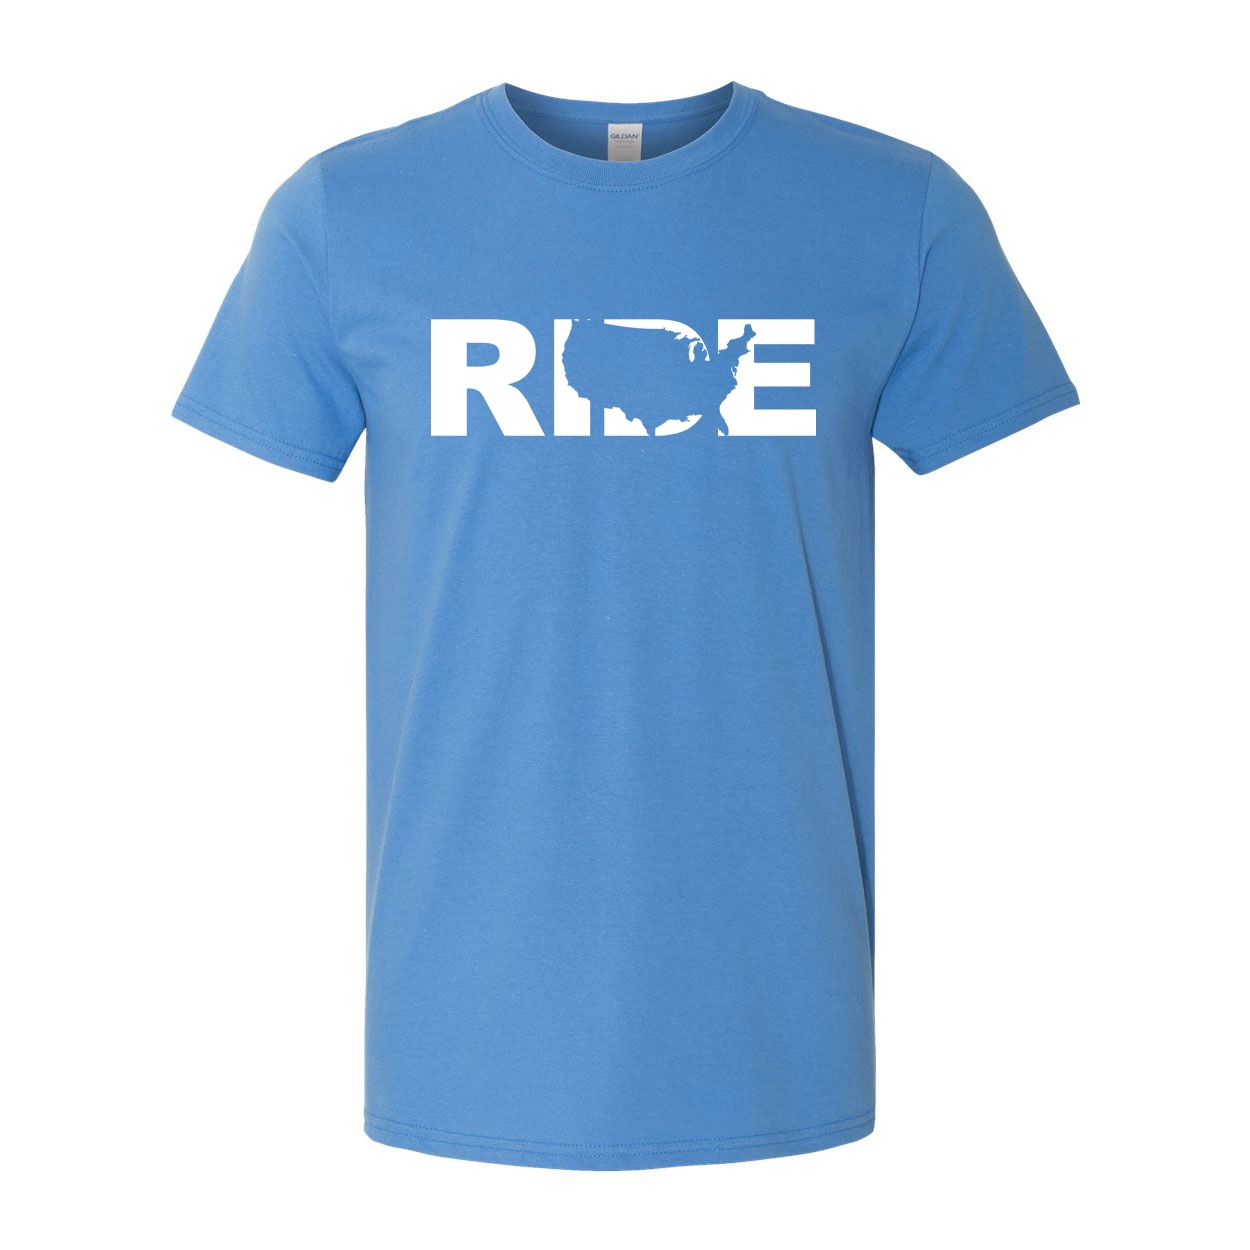 Ride United States Classic T-Shirt Iris Blue (White Logo)